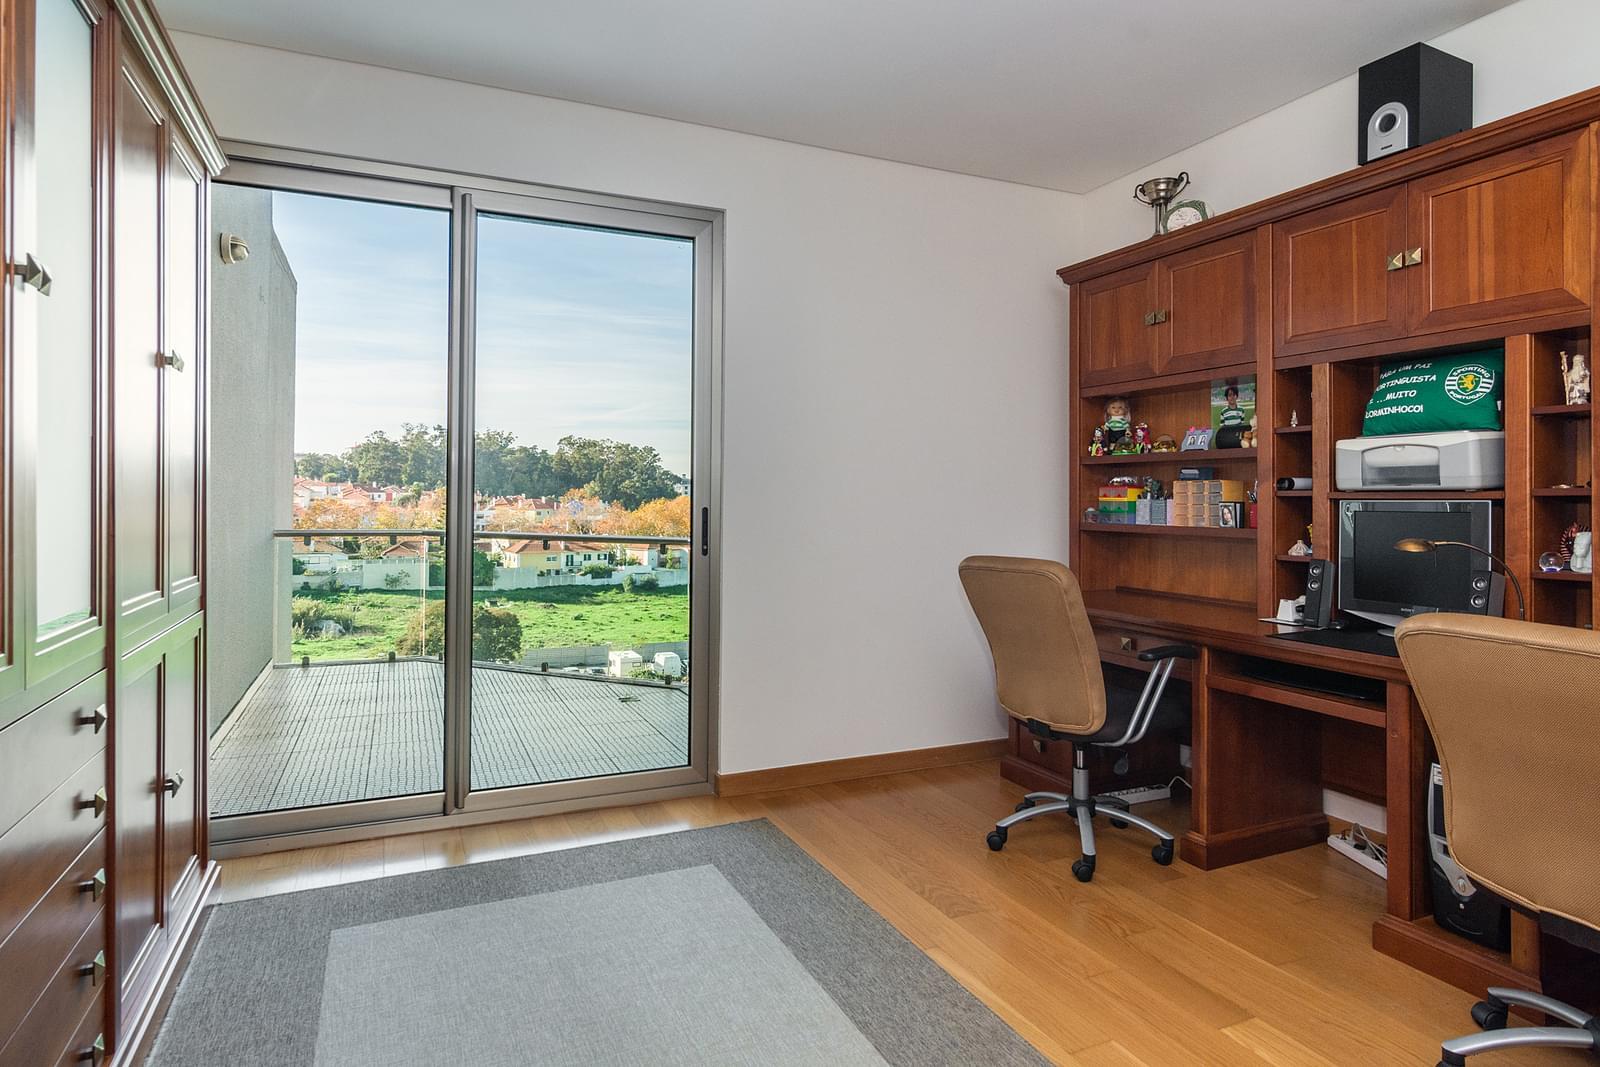 pf14588-apartamento-t5-lisboa-d1f650fd-6ac6-46cd-af0e-ea87386b5a3f